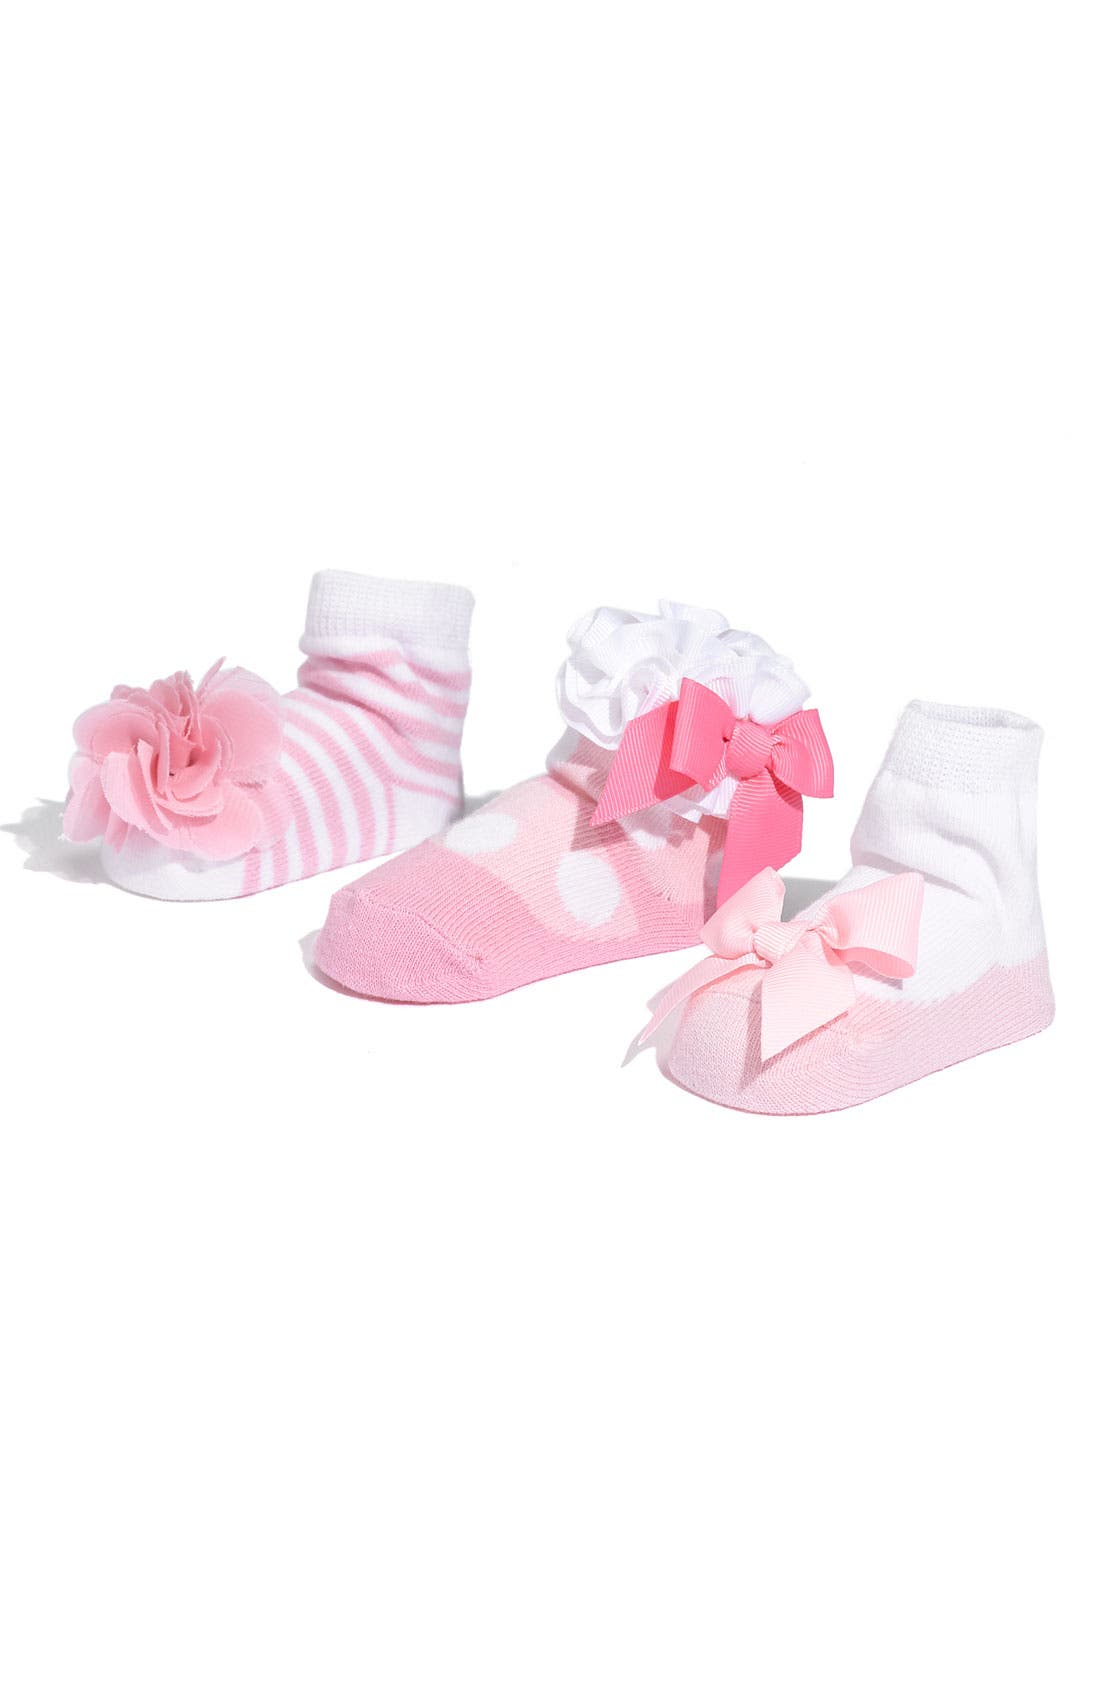 Socks Set,                         Main,                         color, NEW PINK/ WHITE